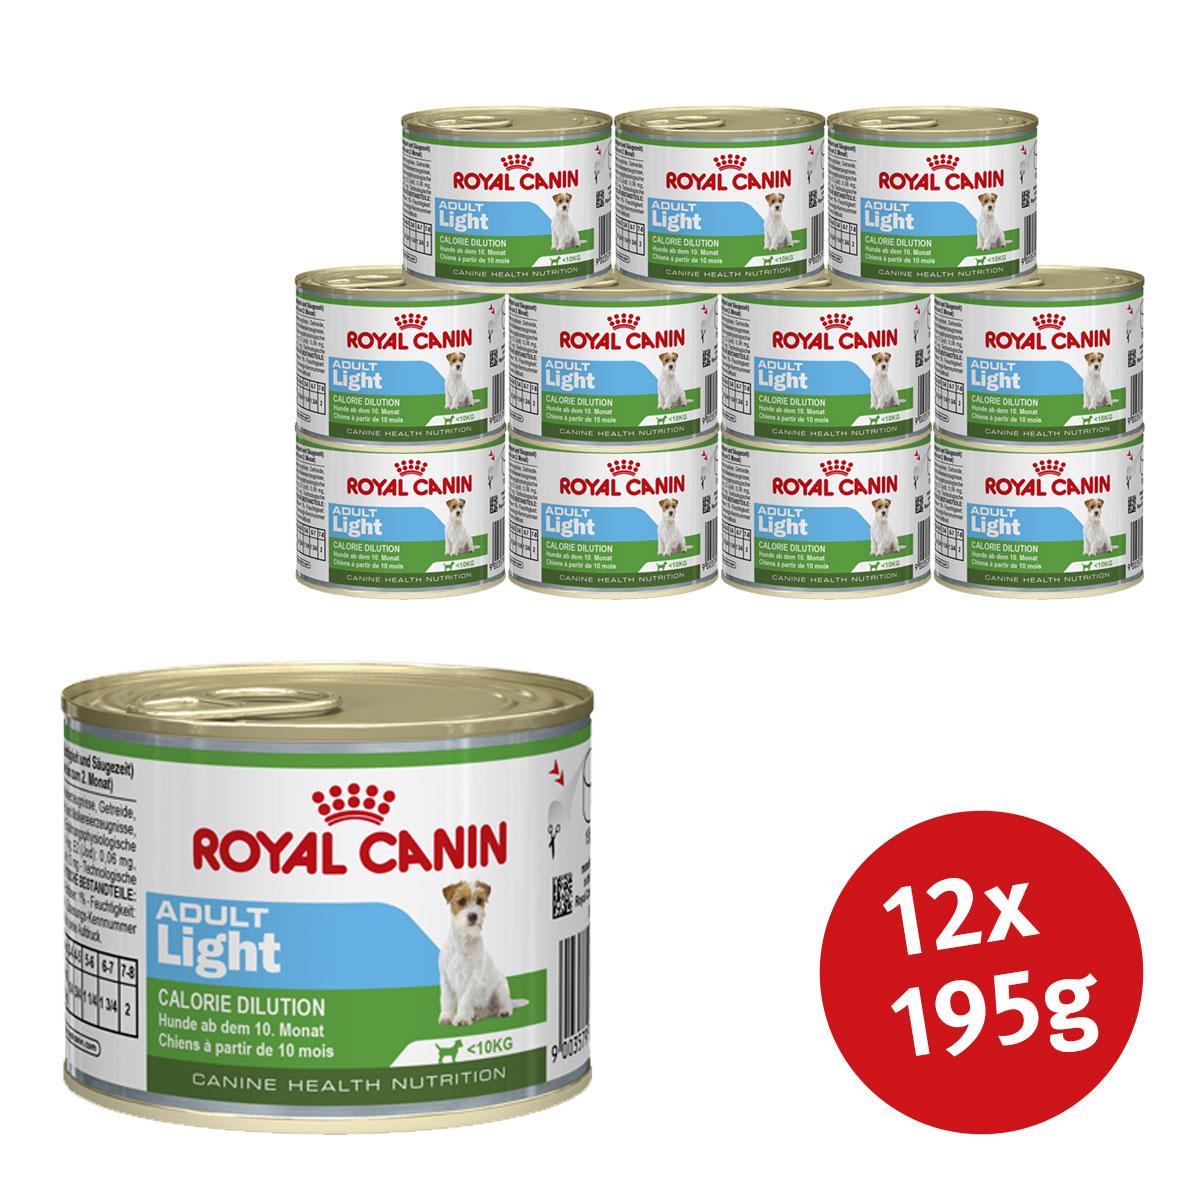 royal canin adult light 12 x195g g nstig kaufen bei zooroyal. Black Bedroom Furniture Sets. Home Design Ideas